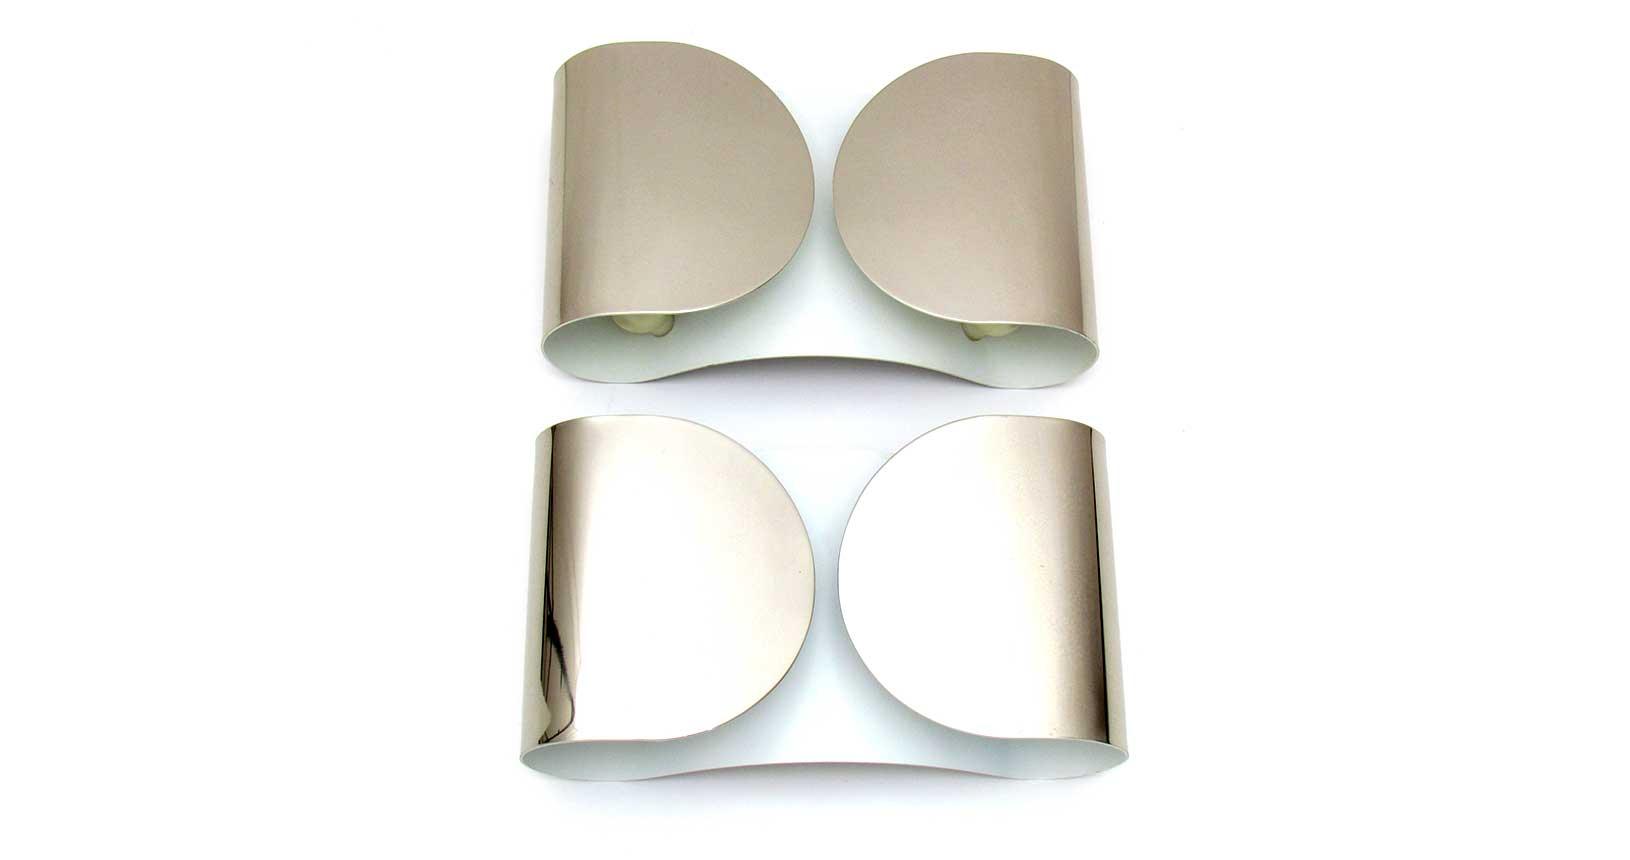 Foglio applique tobia scarpa floss chrome brass wall lamp vintage design iconic design